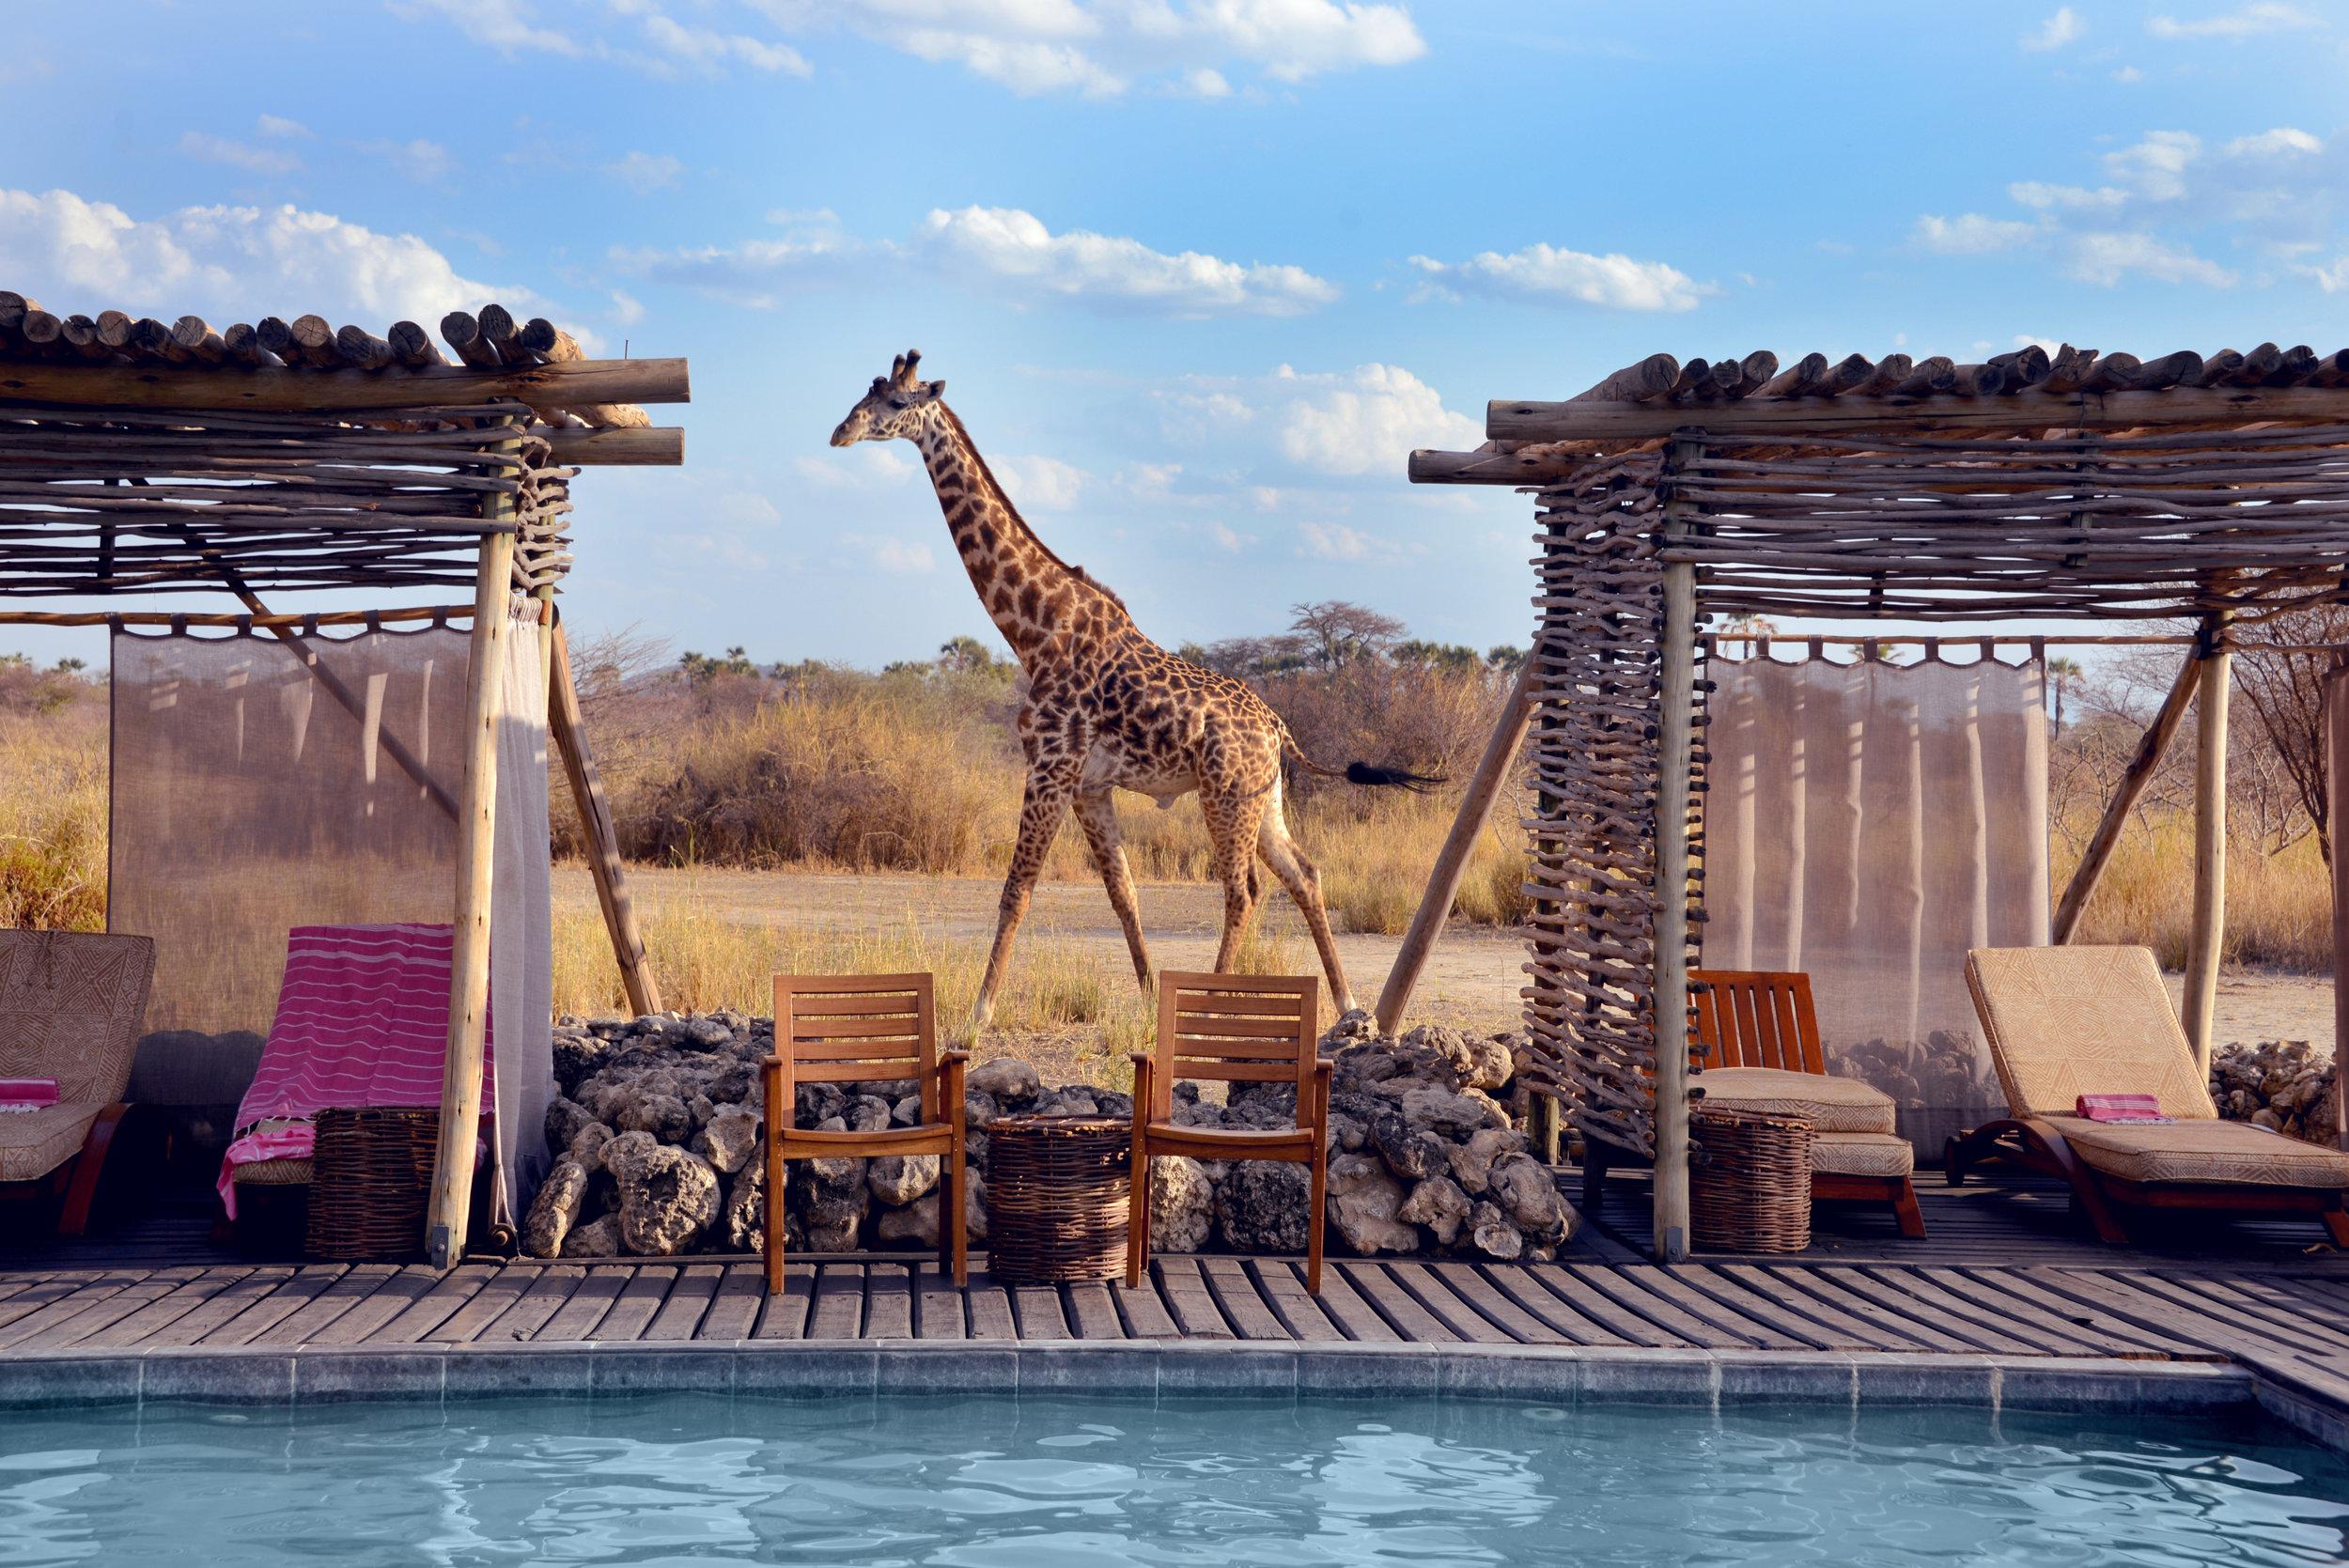 Giraffe By The Pool - Chem Chem Lodge